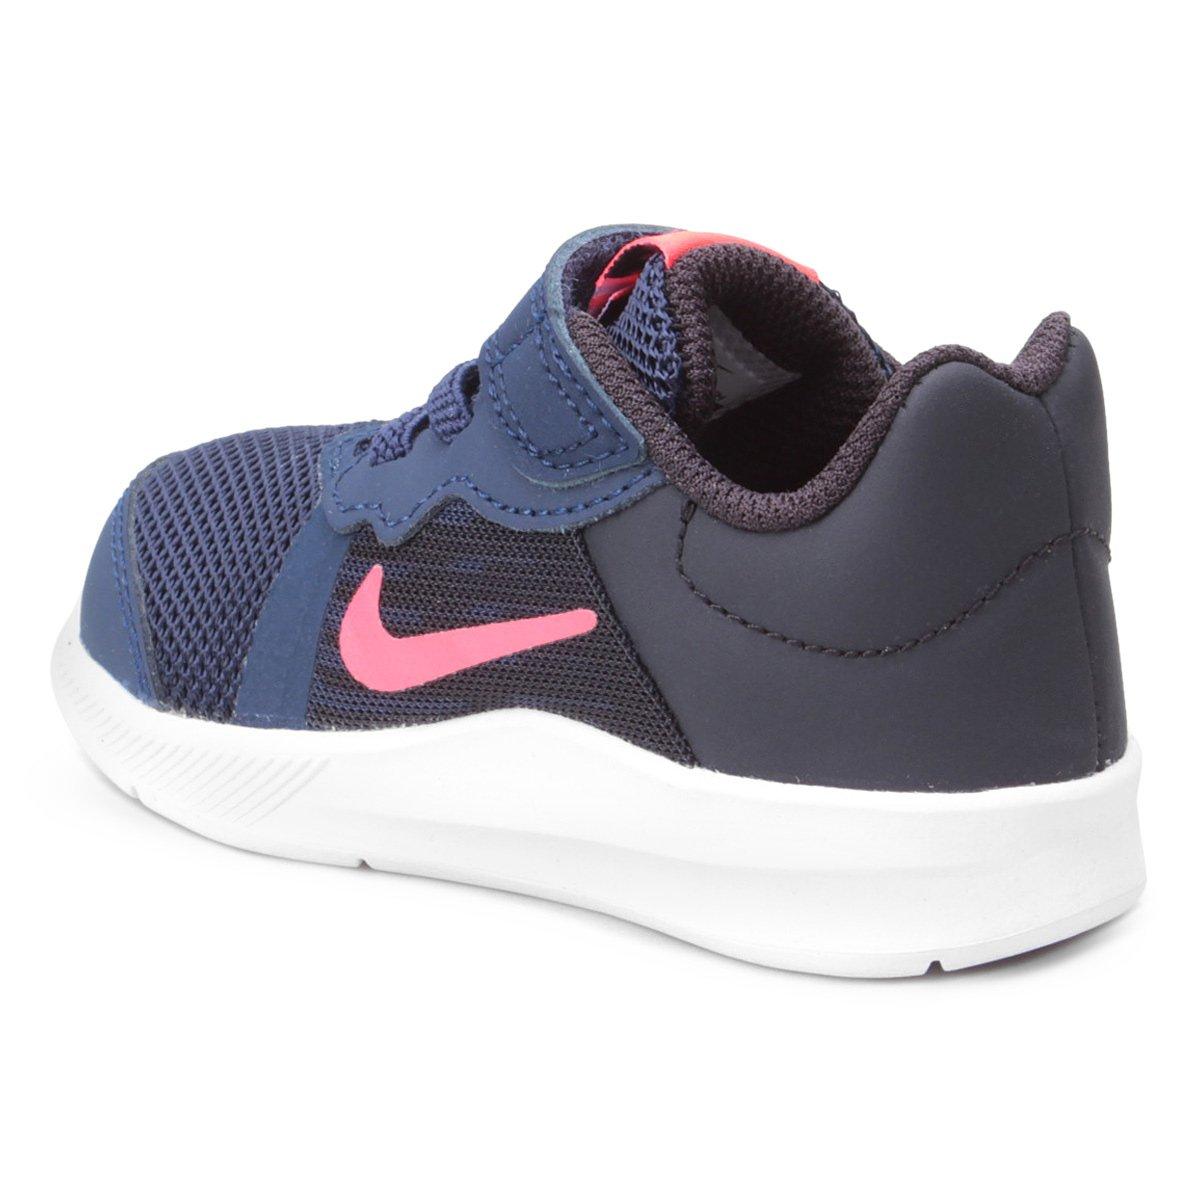 71fb42a5b19 Foto 2 - Tênis Infantil Nike Downshifter 8 Gtv Com Velcro Feminino